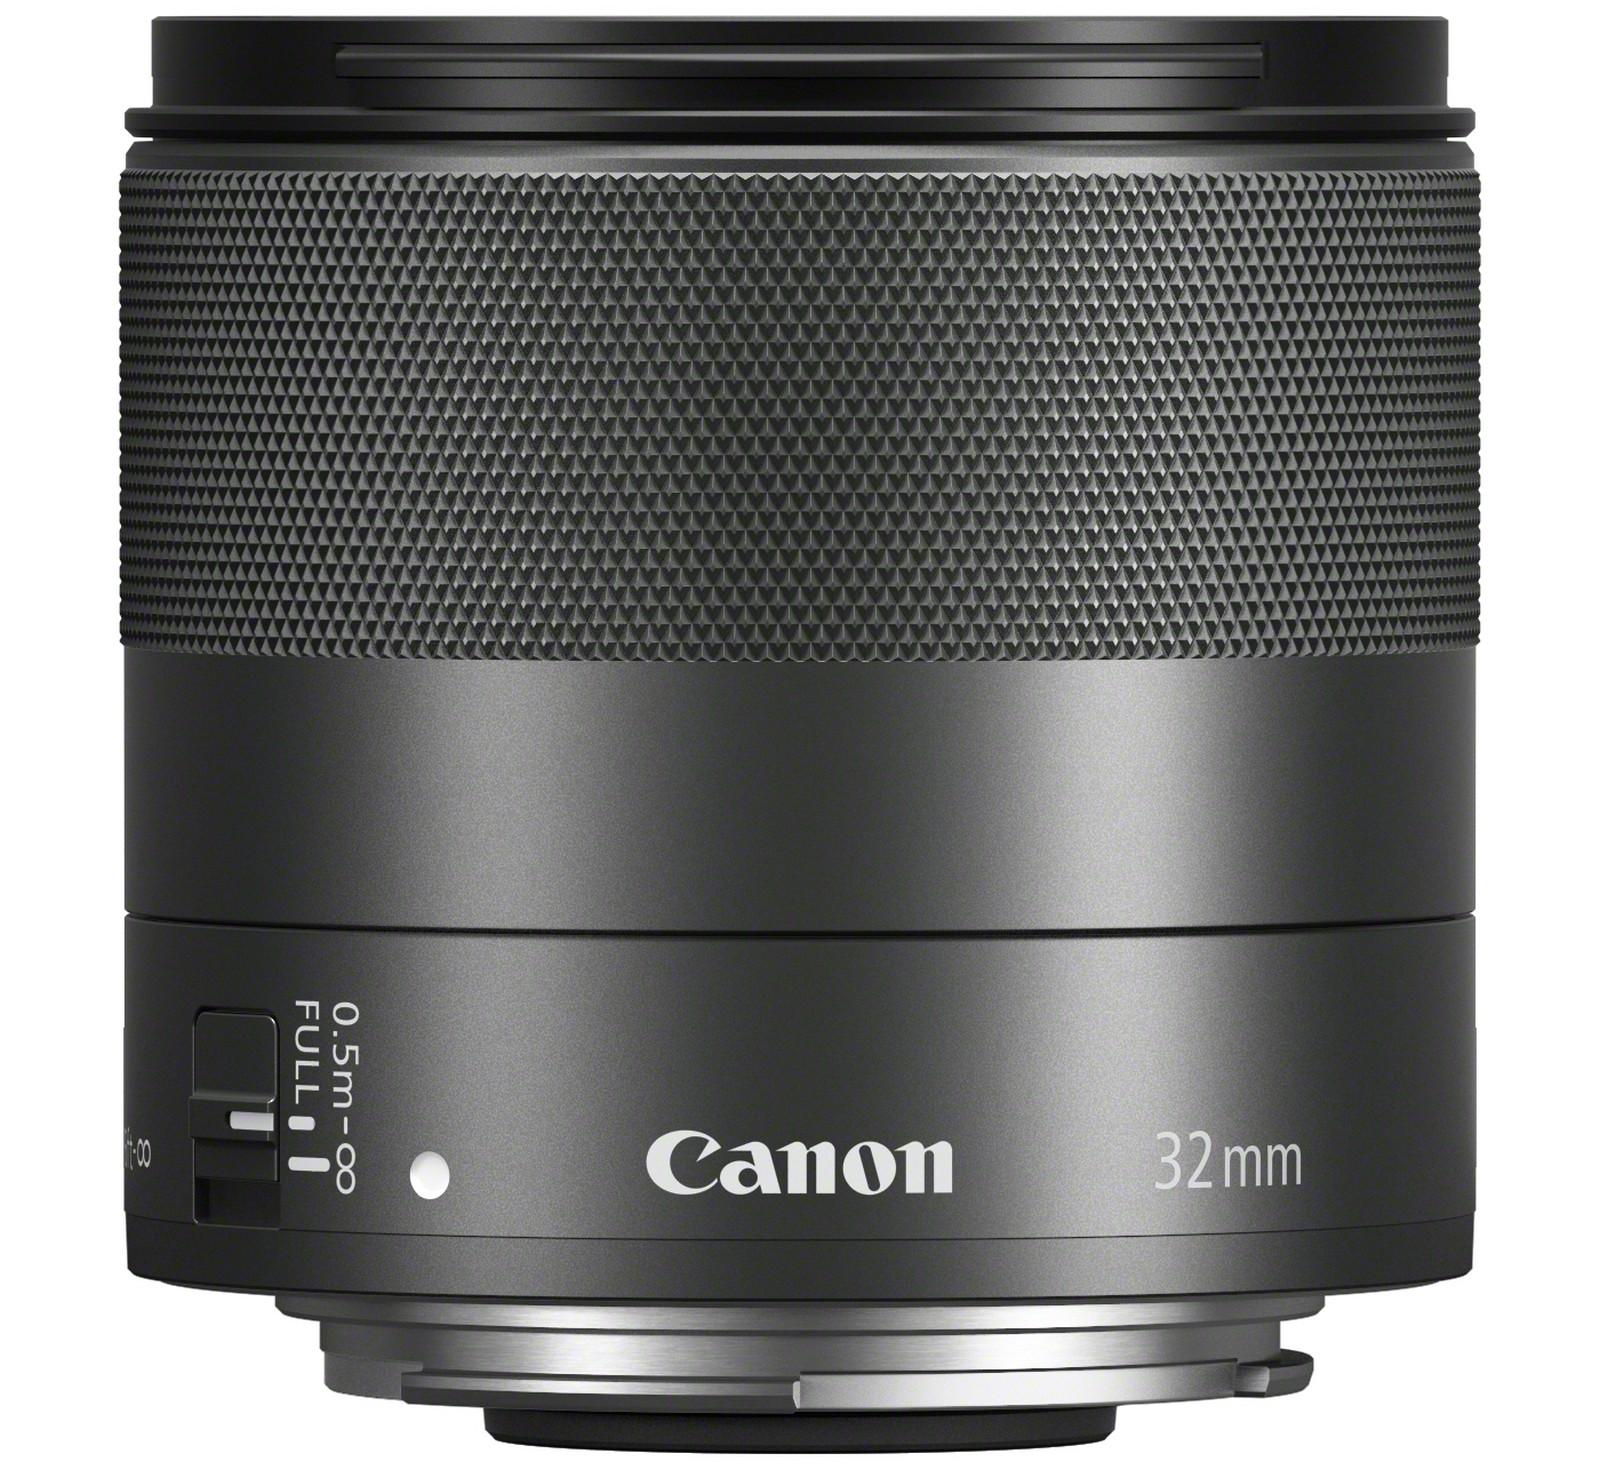 canon m 32 mm lens